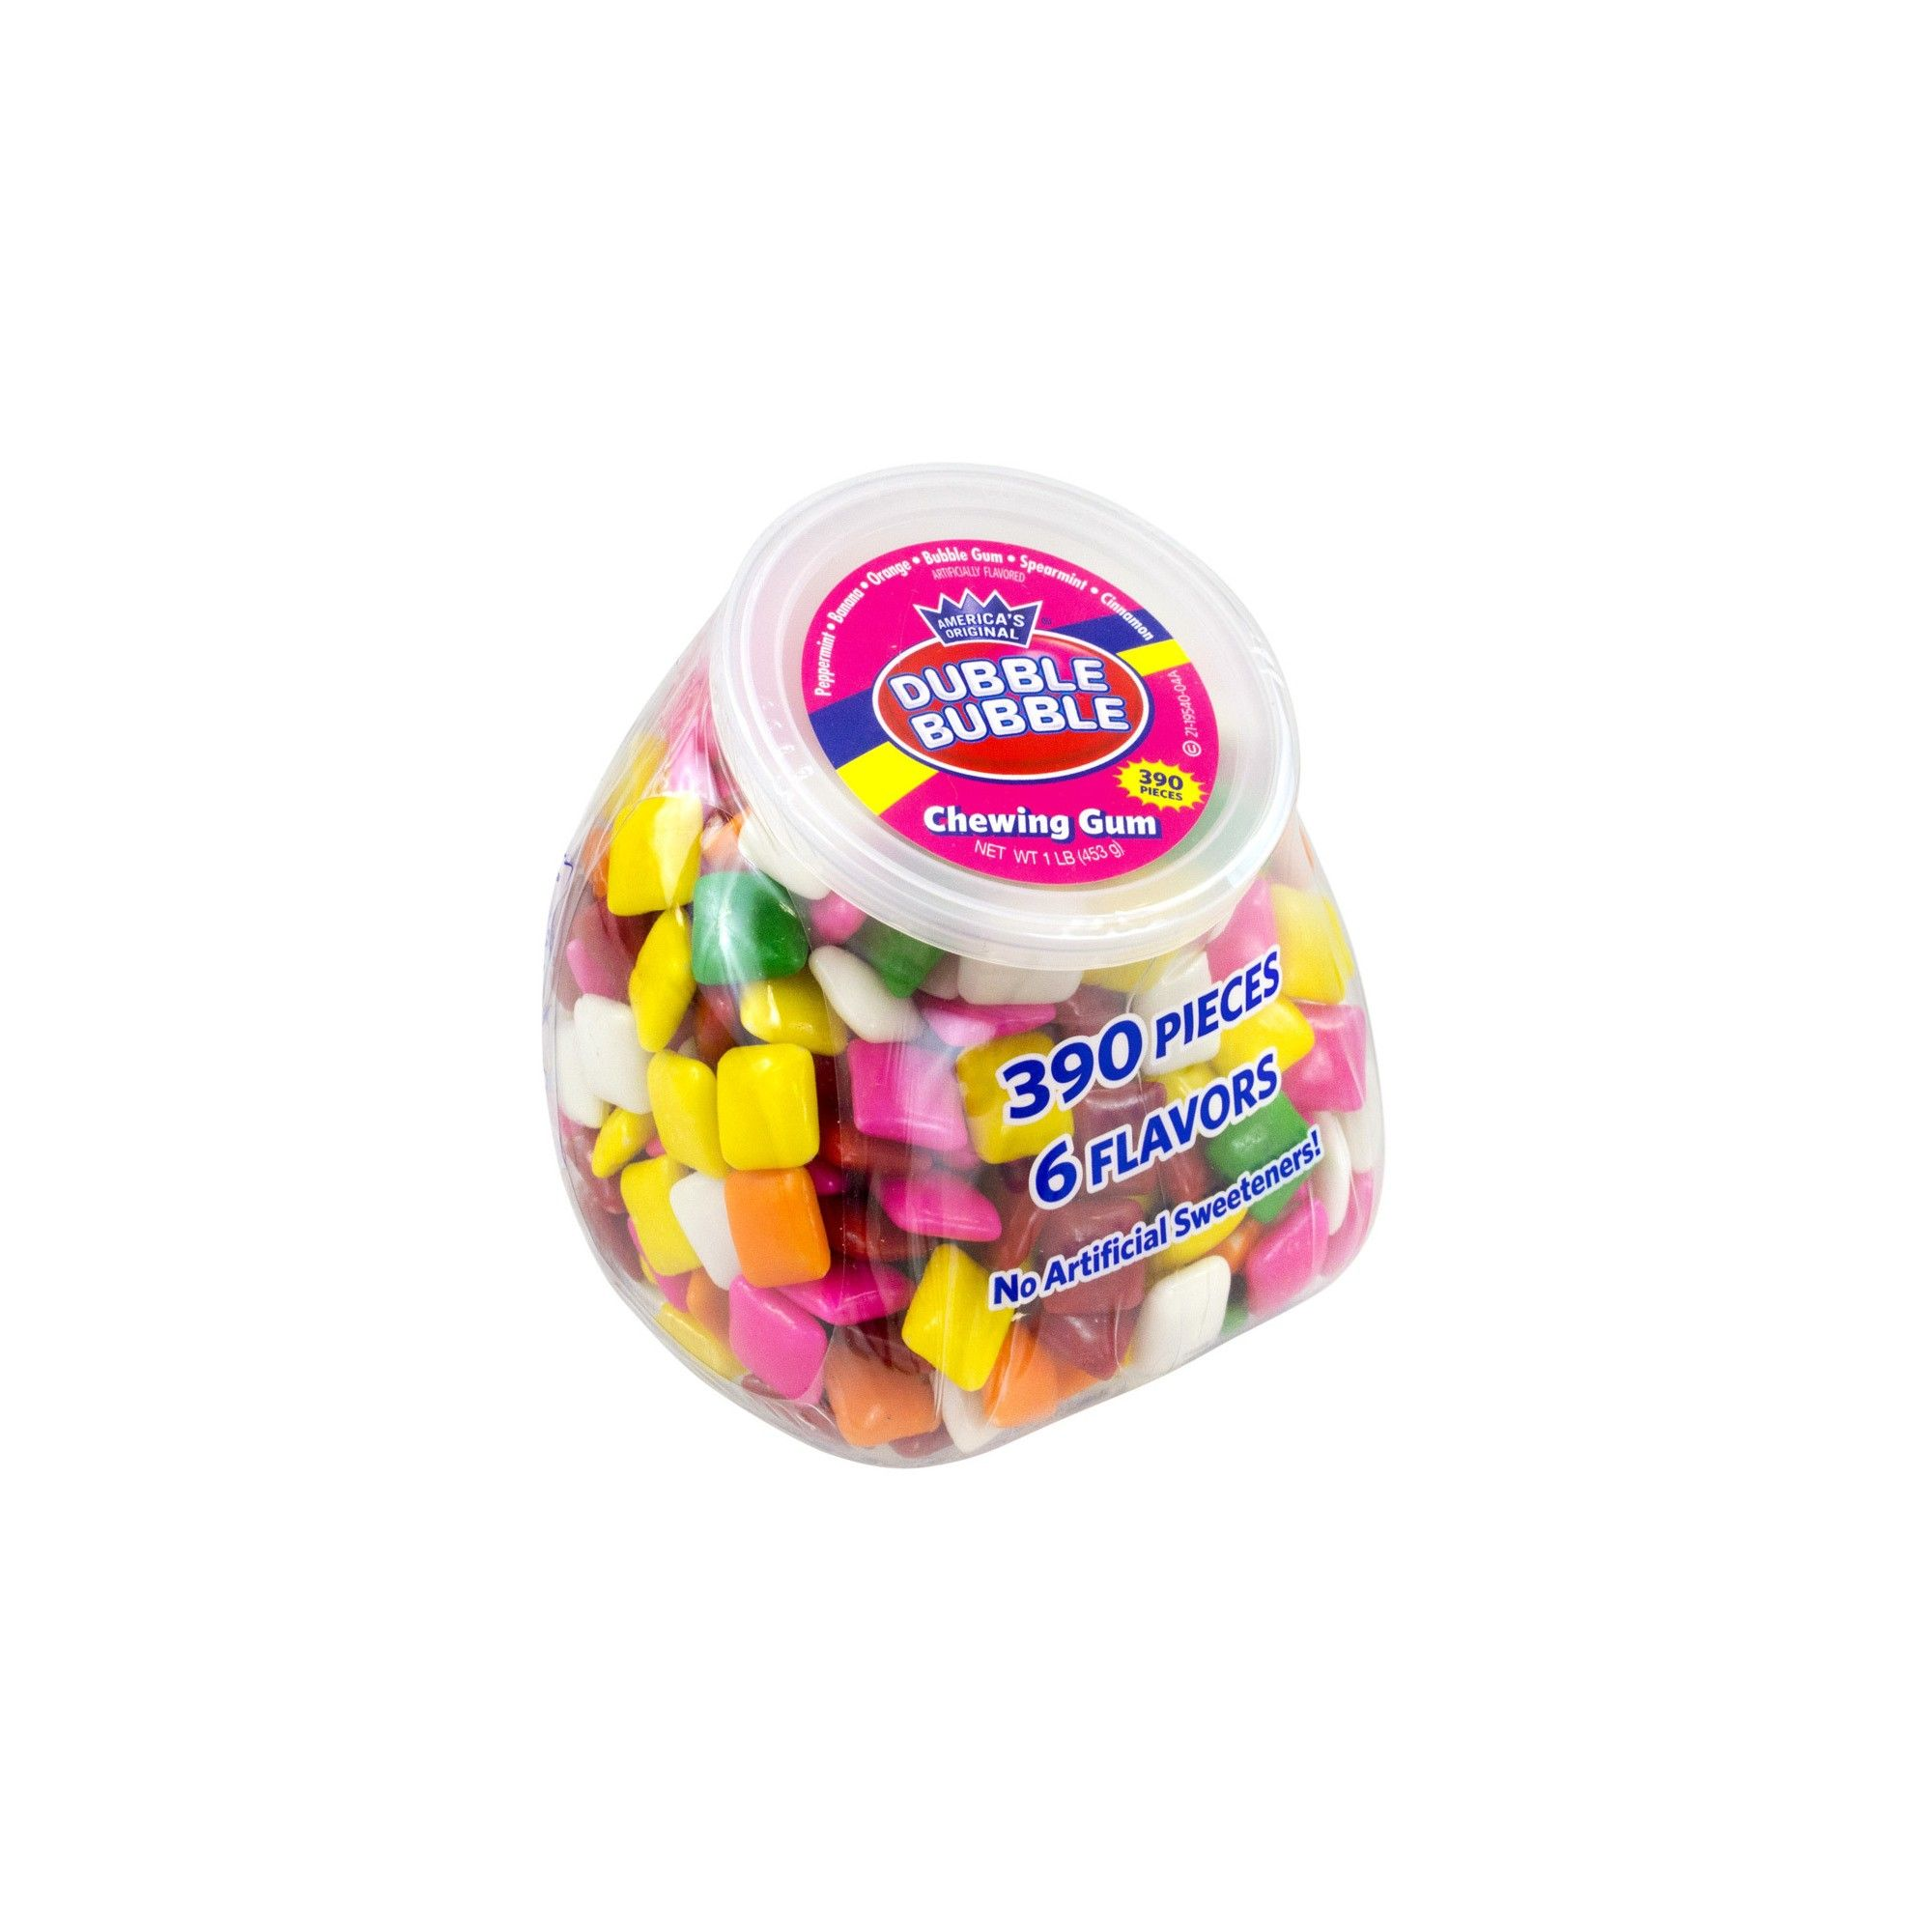 Dubble Bubble Chewing Gum Office Pleasures Tub - 390ct | Products ...